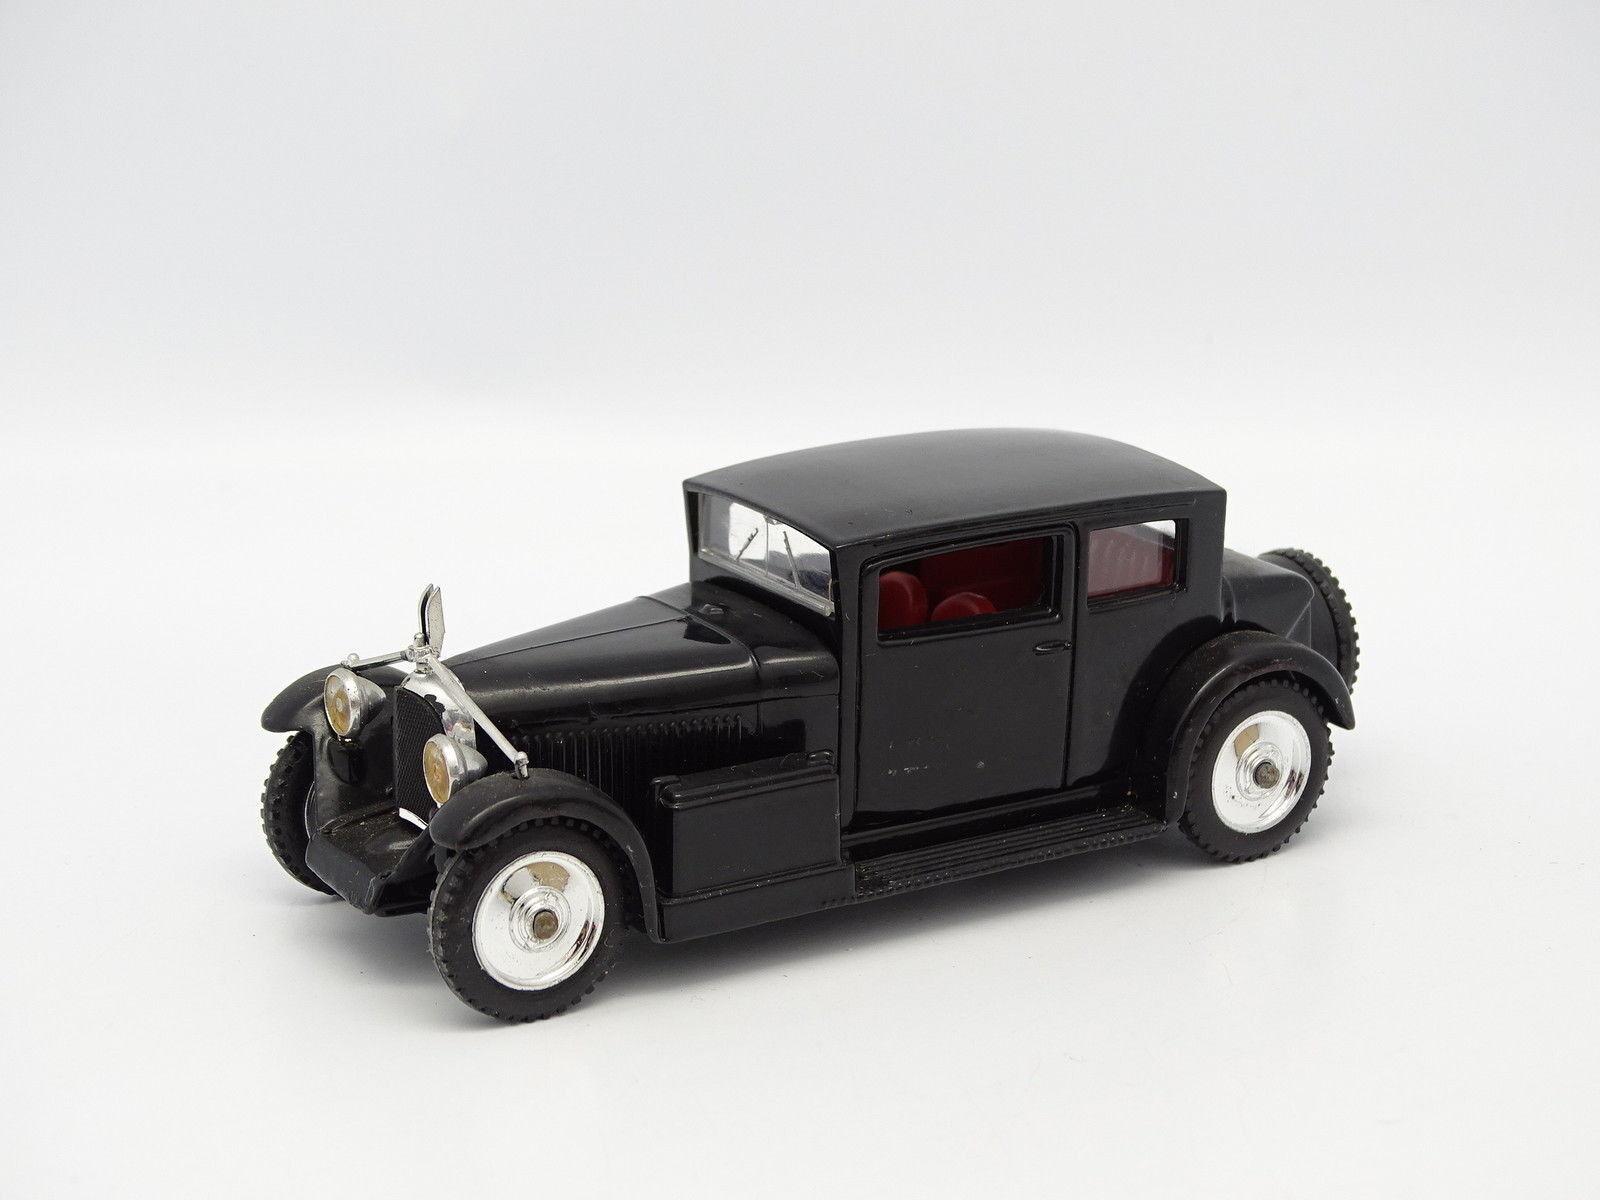 Solido Sb 1 43 - Voisin Carene 1934 black black black 0e2159